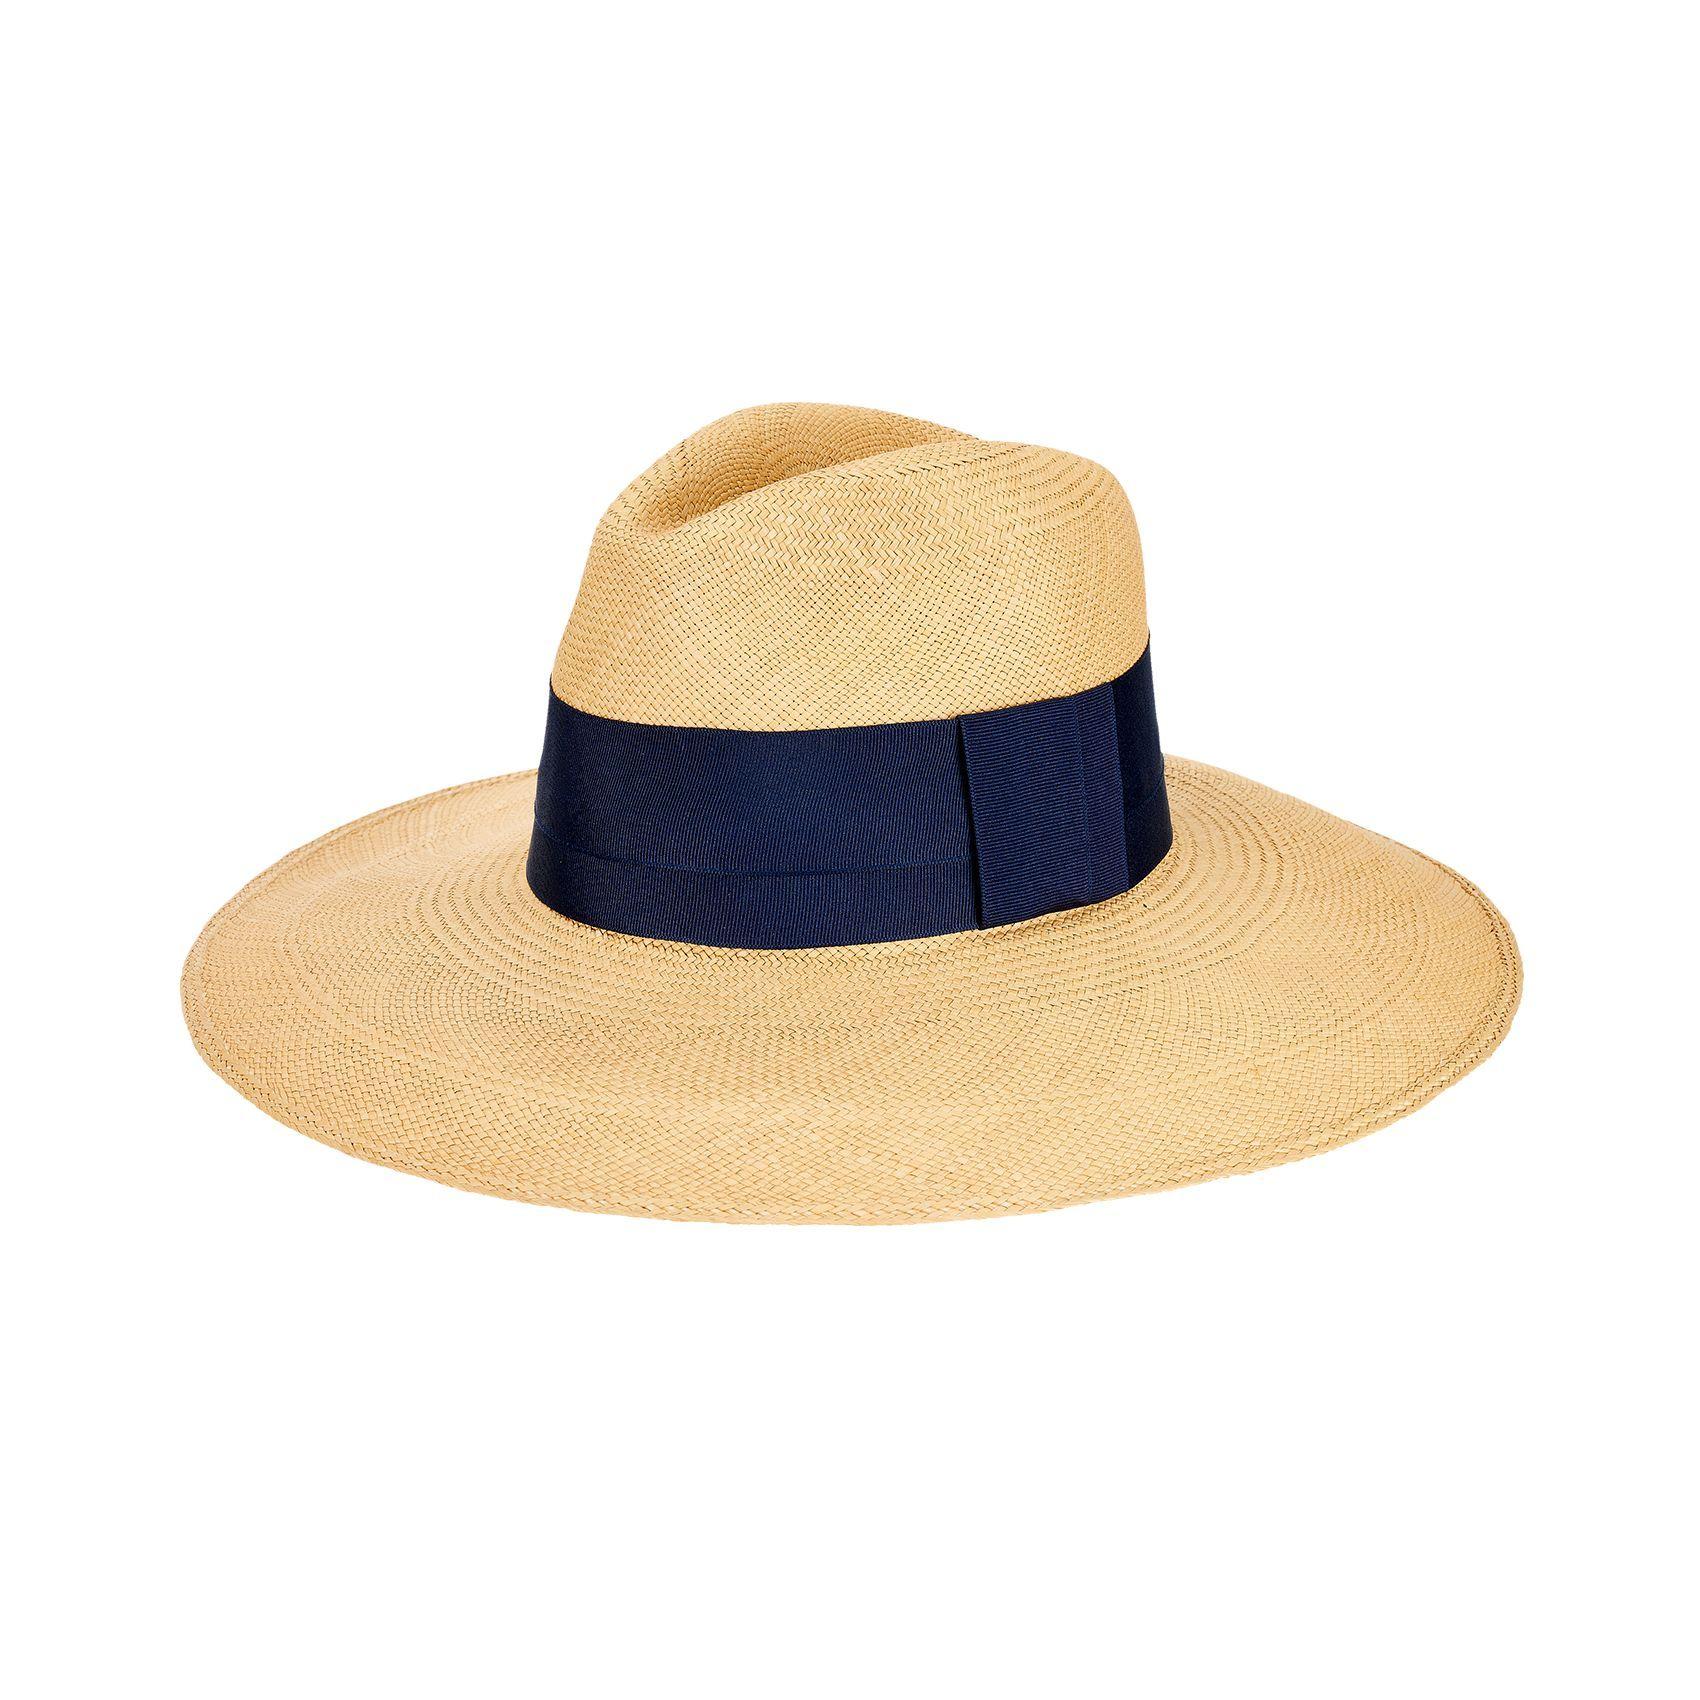 878023df3c382 Handmade in Ecuador from 100% Toquilla straw Shape   Clasico  wide-brim  Panama hat Brim size  4